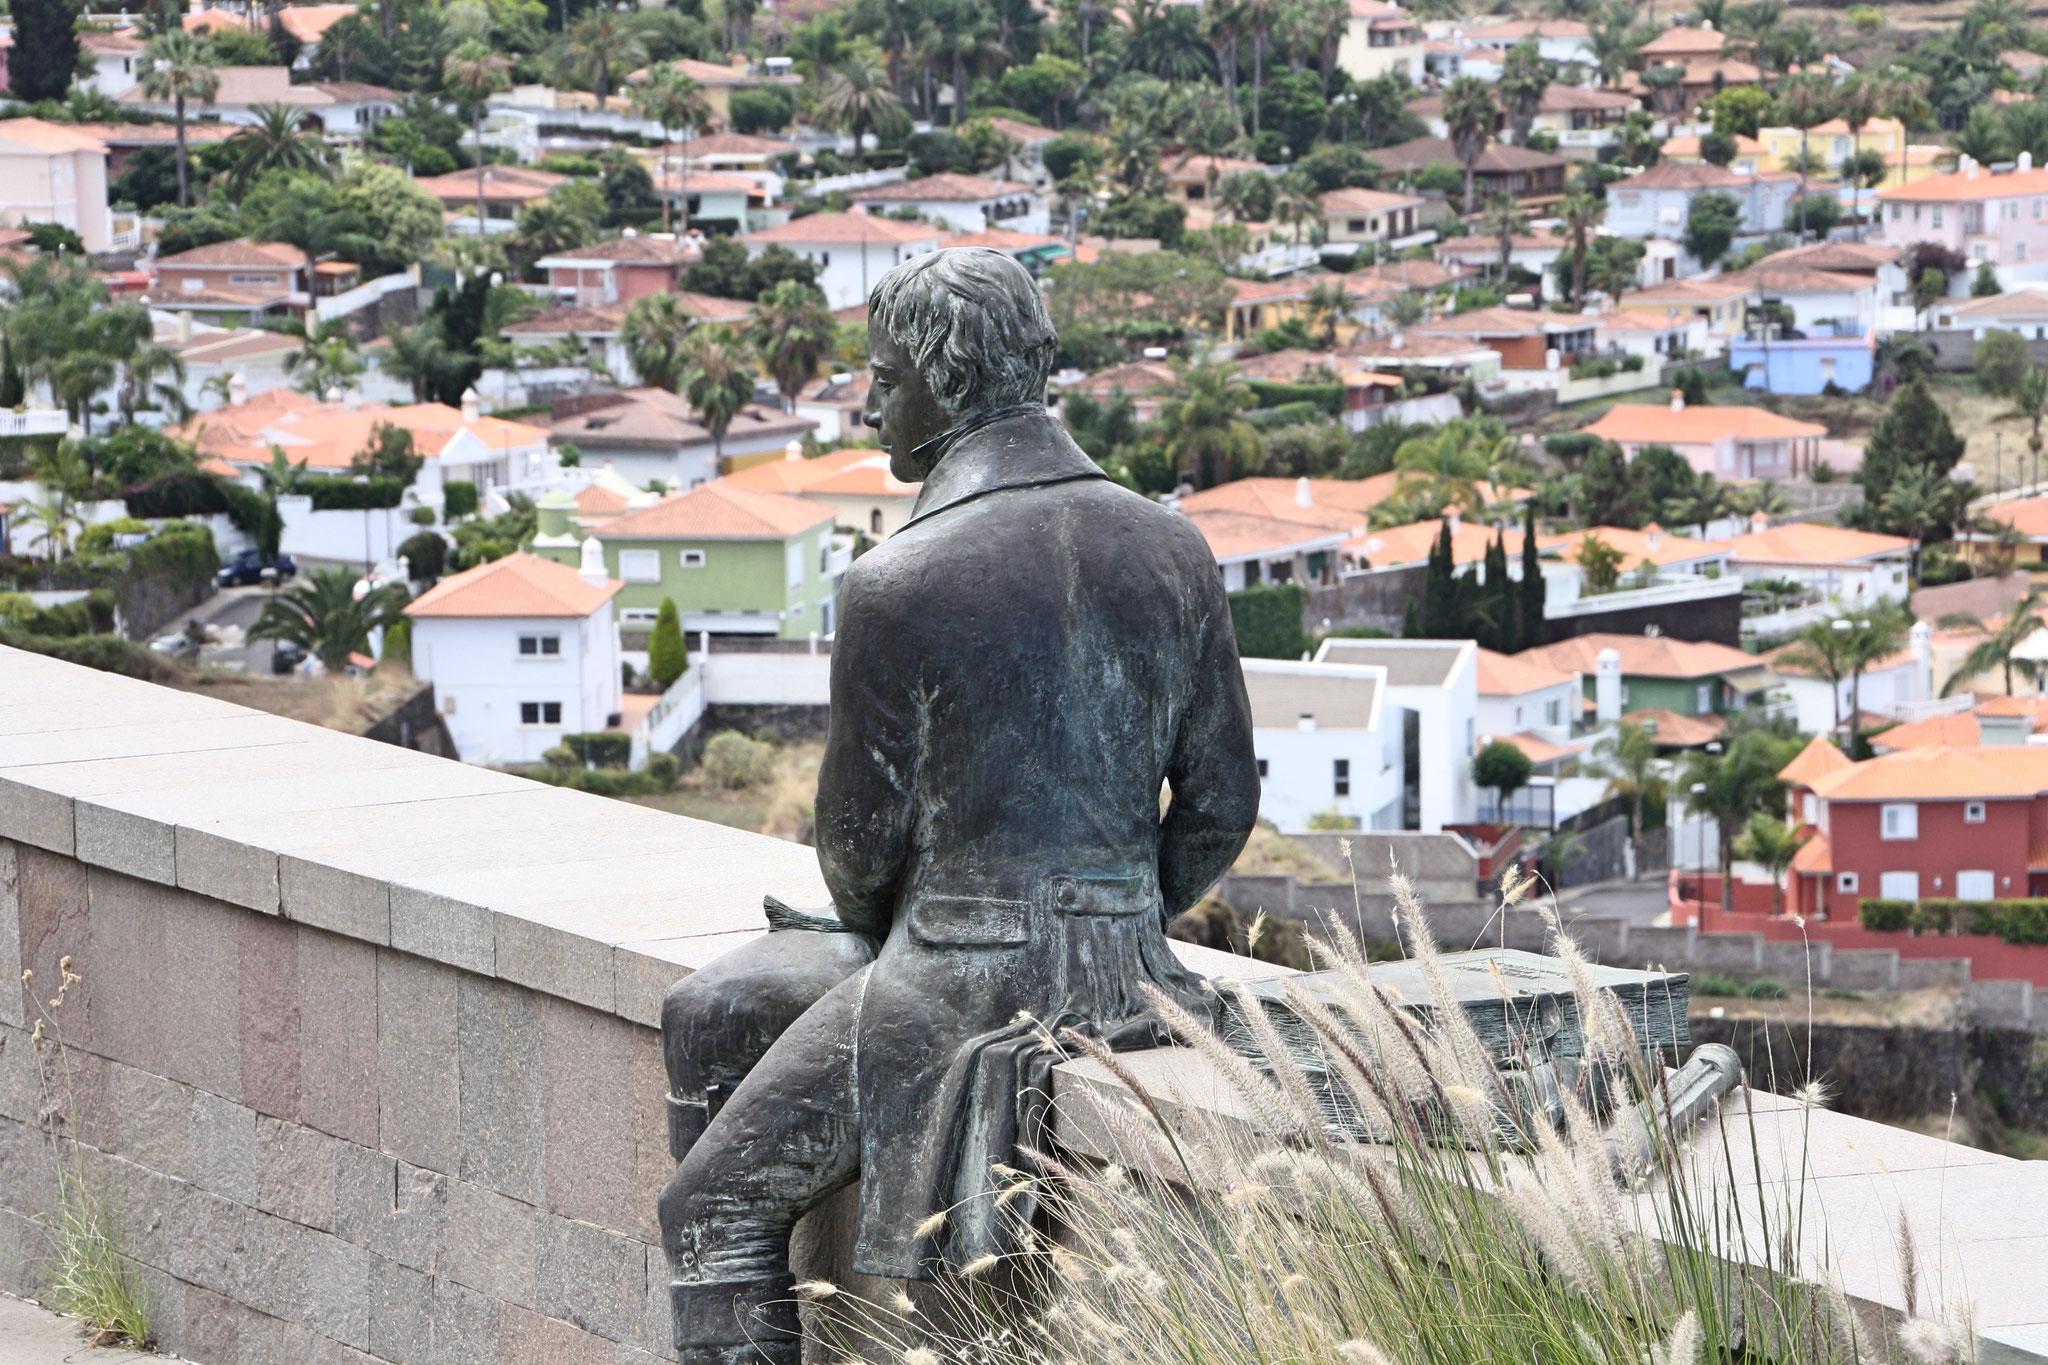 Humboldt-Statue. Mirador Humboldt, Teneriffa. Radiobeitrag für Deutschlandfunk